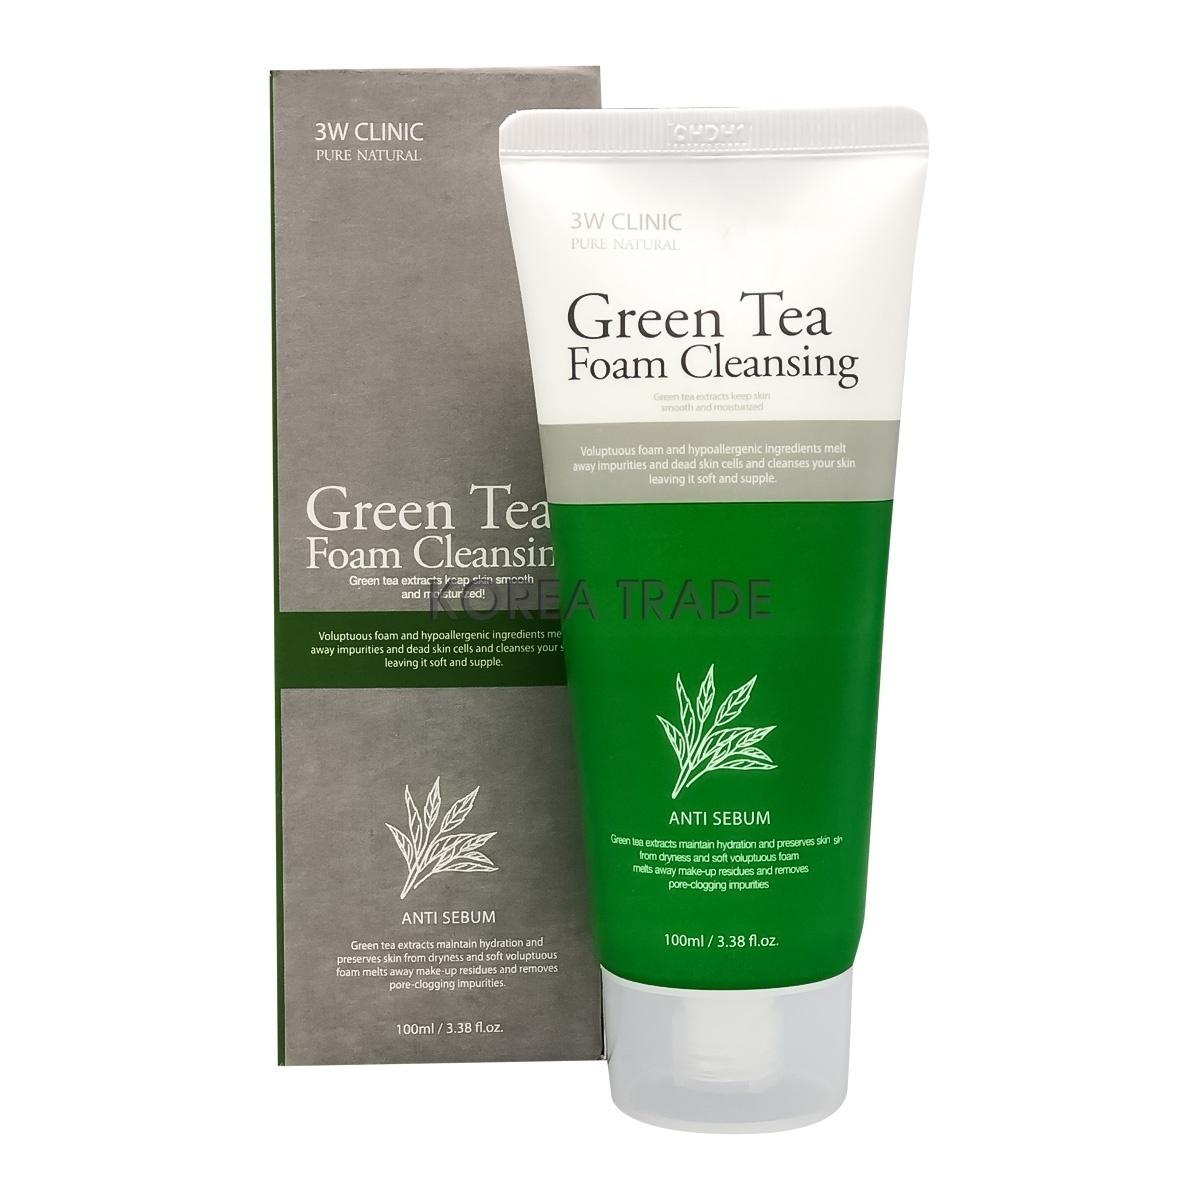 Пенки для умывания Пенка для умывания ЗЕЛЕНЫЙ ЧАЙ 3W CLINIC Green Tea Foam Cleansing 100 мл 6020316753.jpg